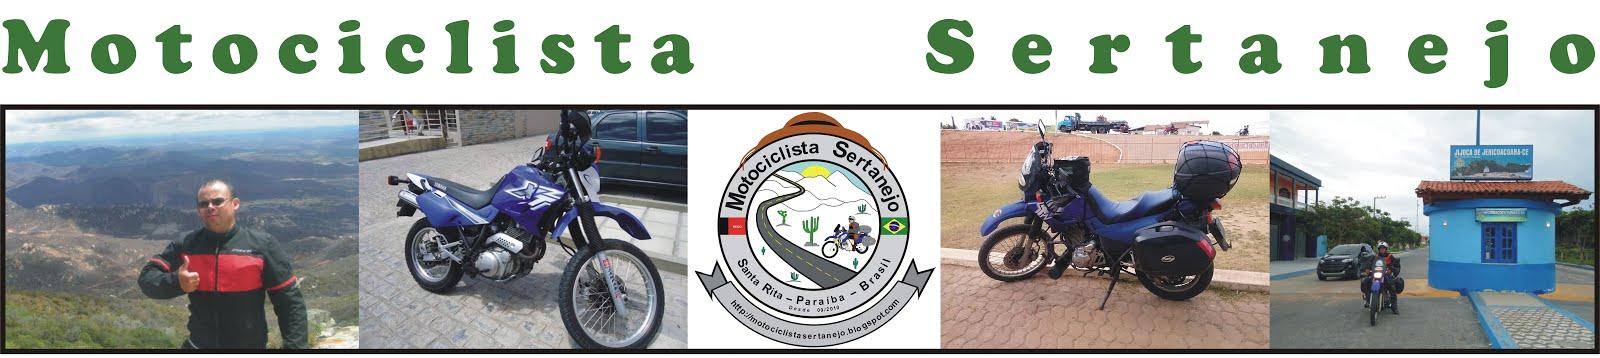 Motociclista Sertanejo